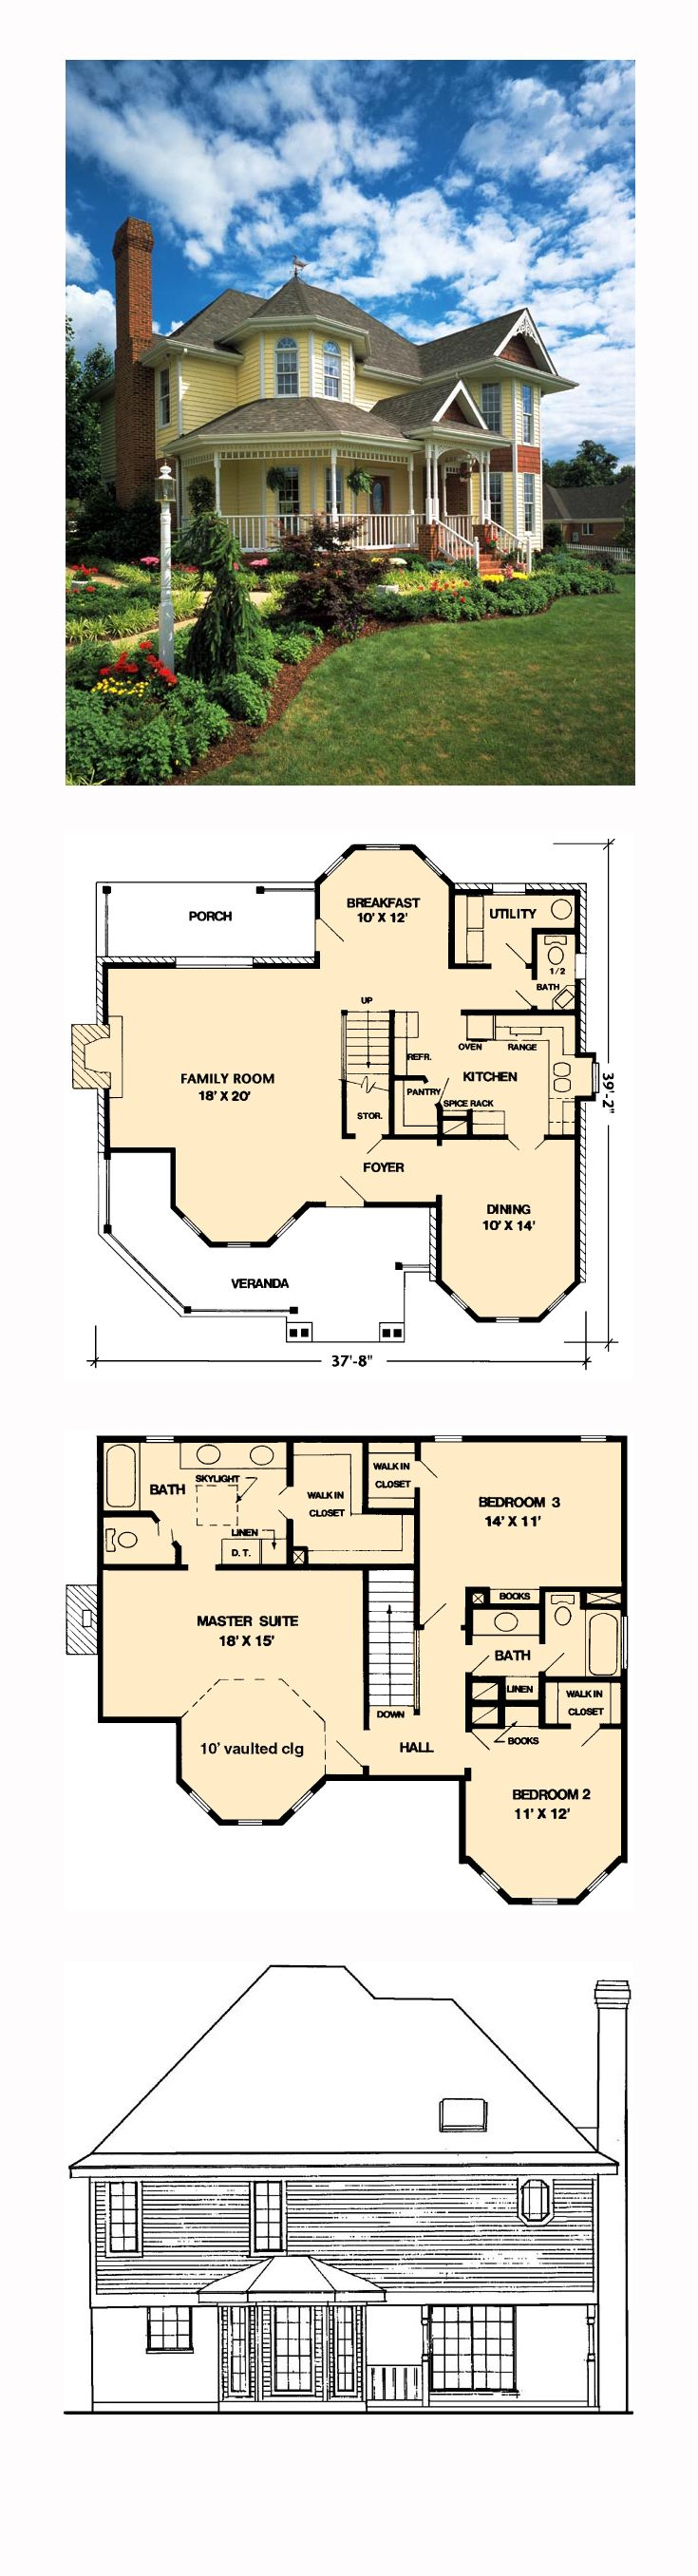 best 25 victorian house plans ideas on pinterest minecraft victorian house blueprints www galleryhip com